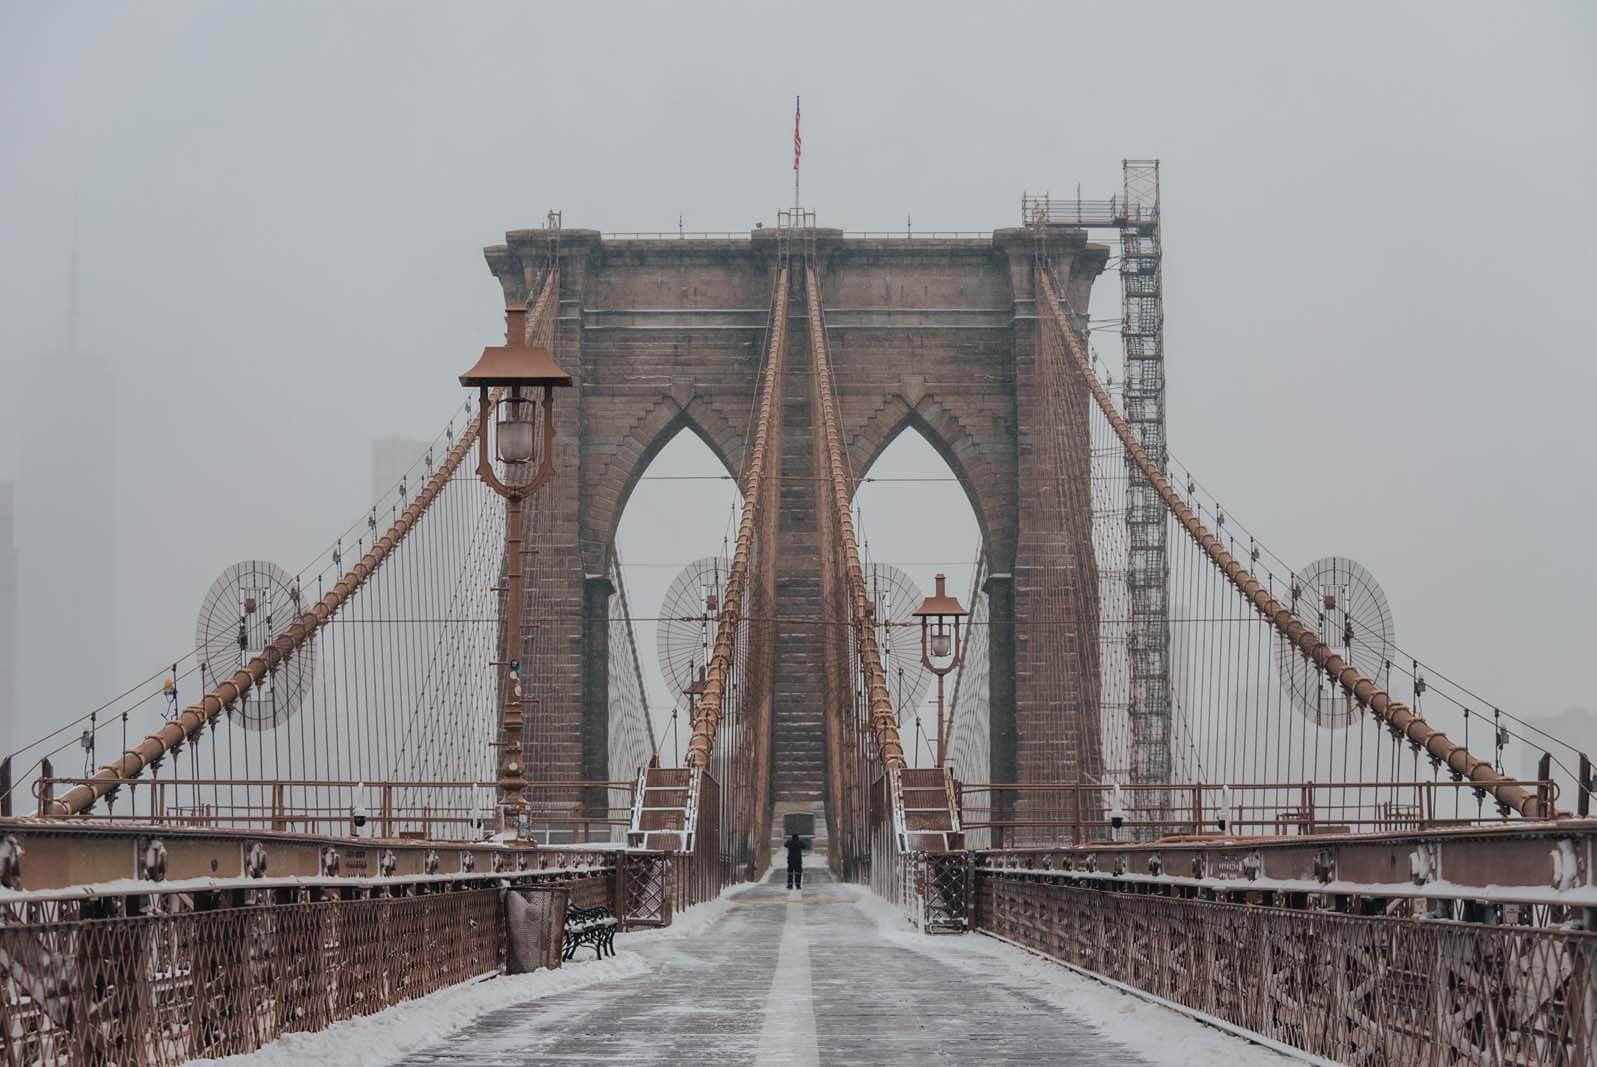 Brooklyn Bridge in the snow